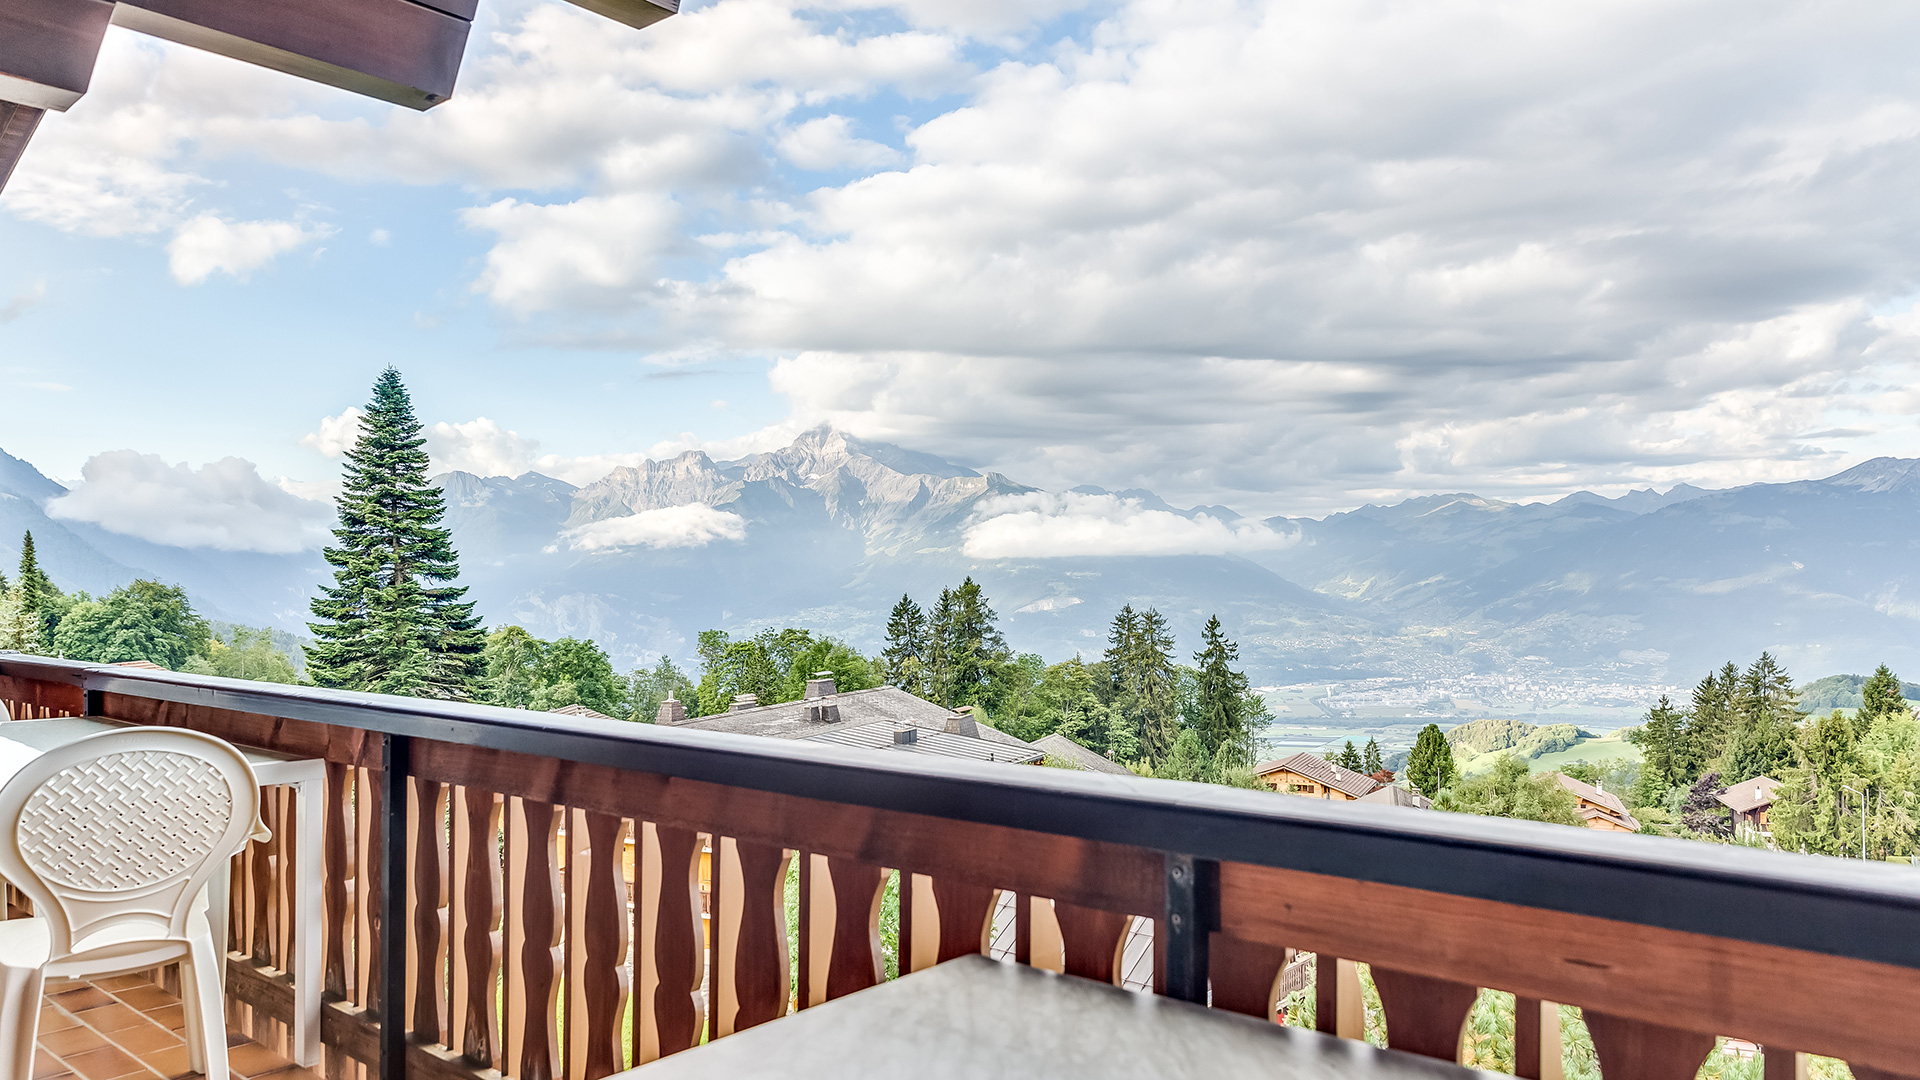 Brevent 13 Apartments, Switzerland